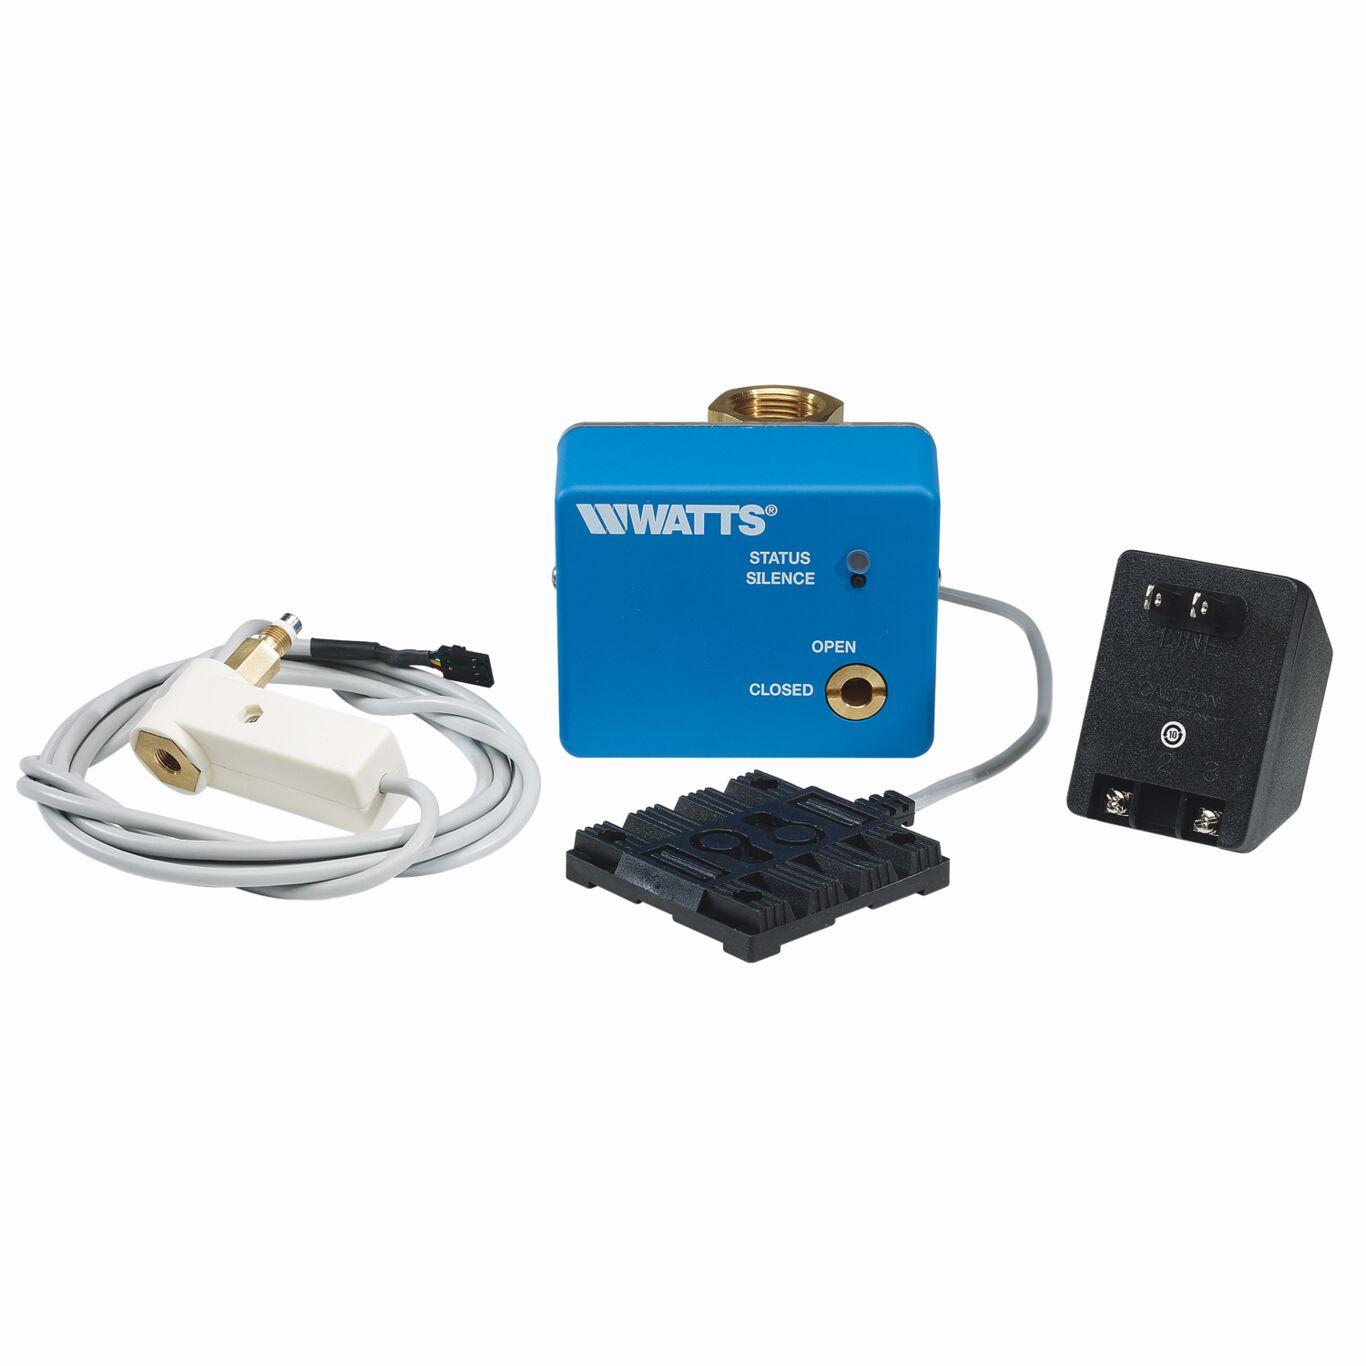 hight resolution of sizes 3 4 1 20 25mm lead free floodsafe water detector shutoff valves